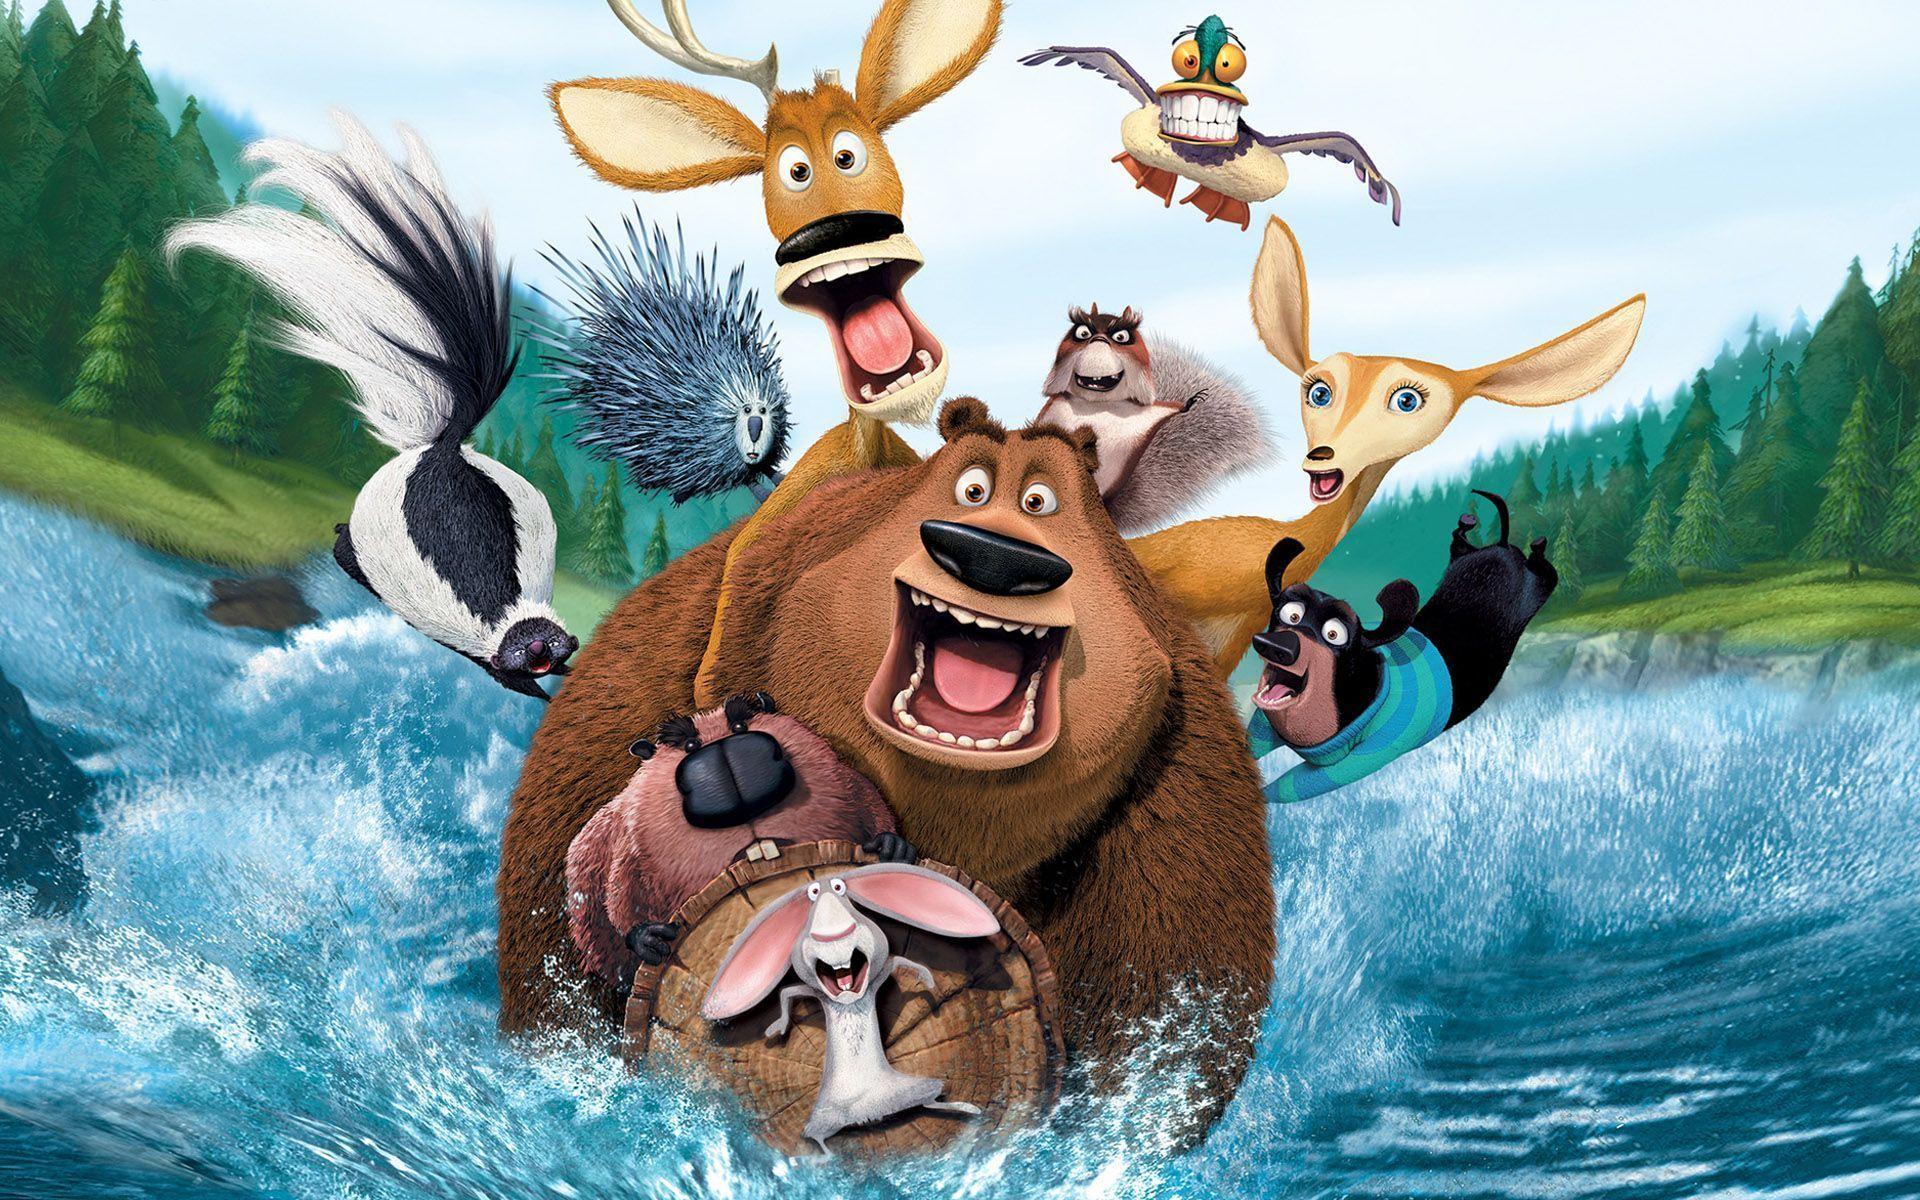 Most Inspiring Wallpaper Movie Animated - f8f5ad0b1cfa8d0ce2132217dc8e31a6  Snapshot_99569.jpg